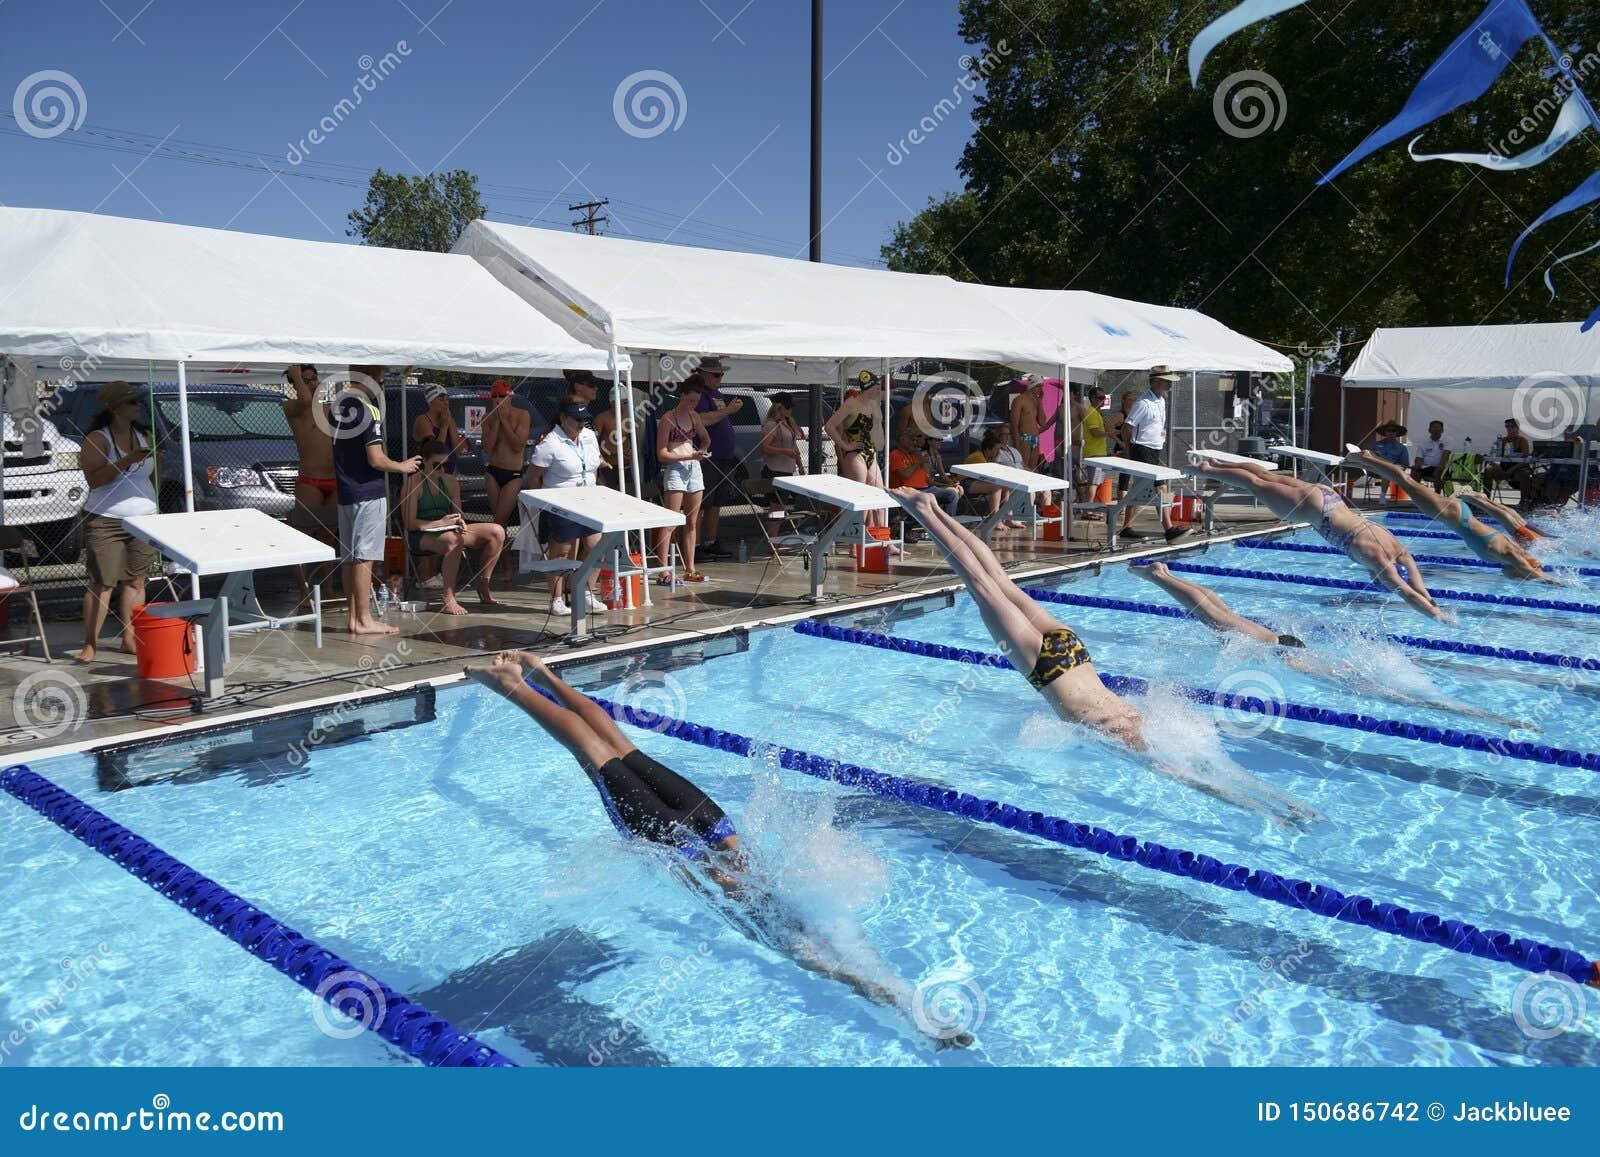 Swimming Meet At Pasco Memorial Aquatic Park Editorial Photography Image Of Meet Held 150686742